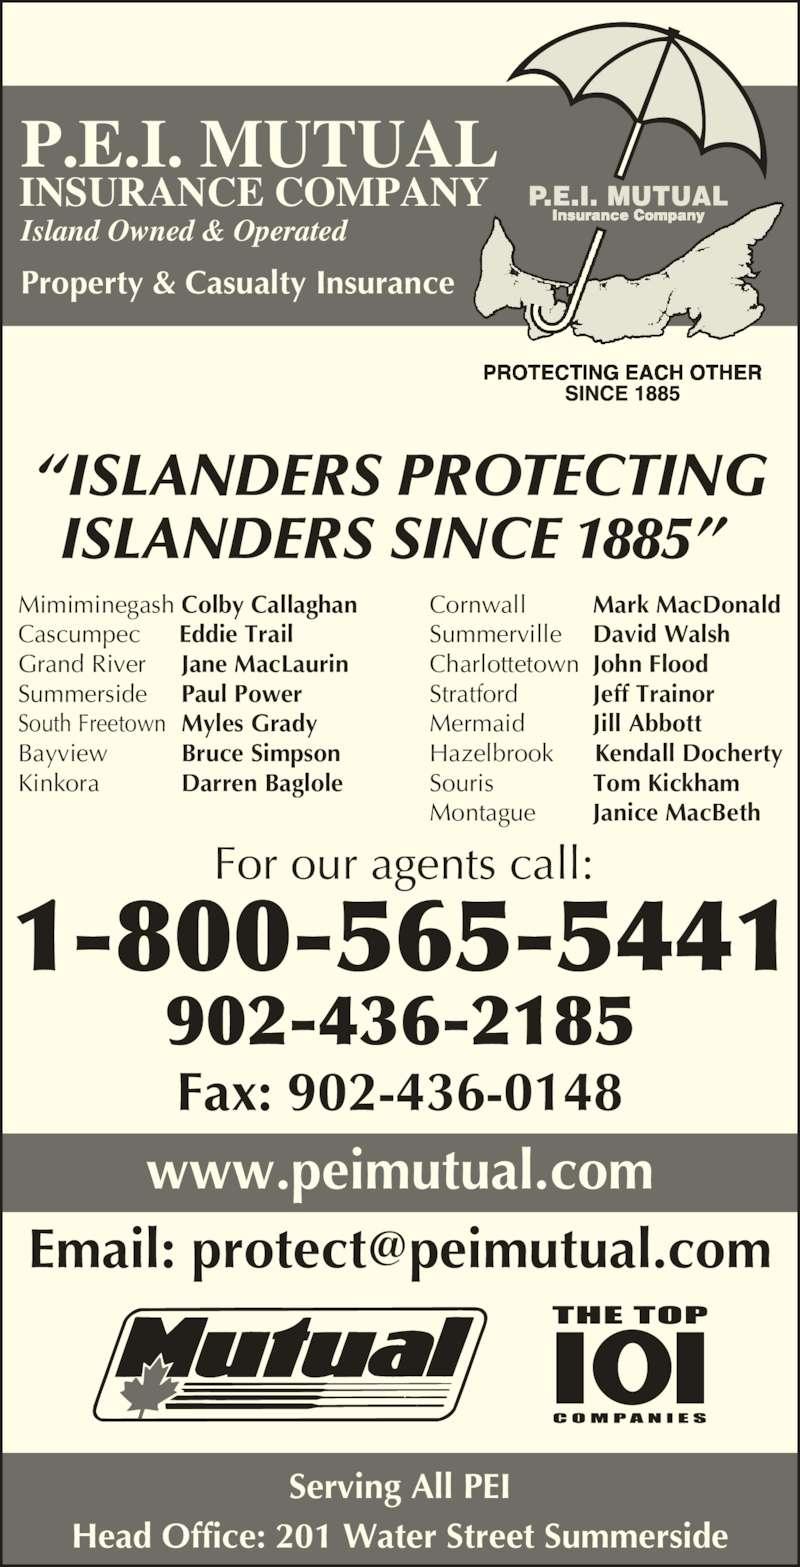 "P E I Mutual Insurance Company (9024362185) - Display Ad - Property & Casualty Insurance P.E.I. MUTUAL INSURANCE COMPANY Fax: 902-436-0148 www.peimutual.com Serving All PEI Head Office: 201 Water Street Summerside ""ISLANDERS PROTECTING ISLANDERS SINCE 1885""  902-436-2185 For our agents call: 1-800-565-5441 Mermaid Jill Abbott Island Owned & Operated Cornwall Mark MacDonald Summerville David Walsh Charlottetown John Flood Stratford Jeff Trainor Hazelbrook      Kendall Docherty Souris Tom Kickham Montague Janice MacBeth Mimiminegash Colby Callaghan Cascumpec      Eddie Trail Grand River Jane MacLaurin Summerside Paul Power South Freetown Myles Grady Bayview Bruce Simpson Kinkora Darren Baglole"